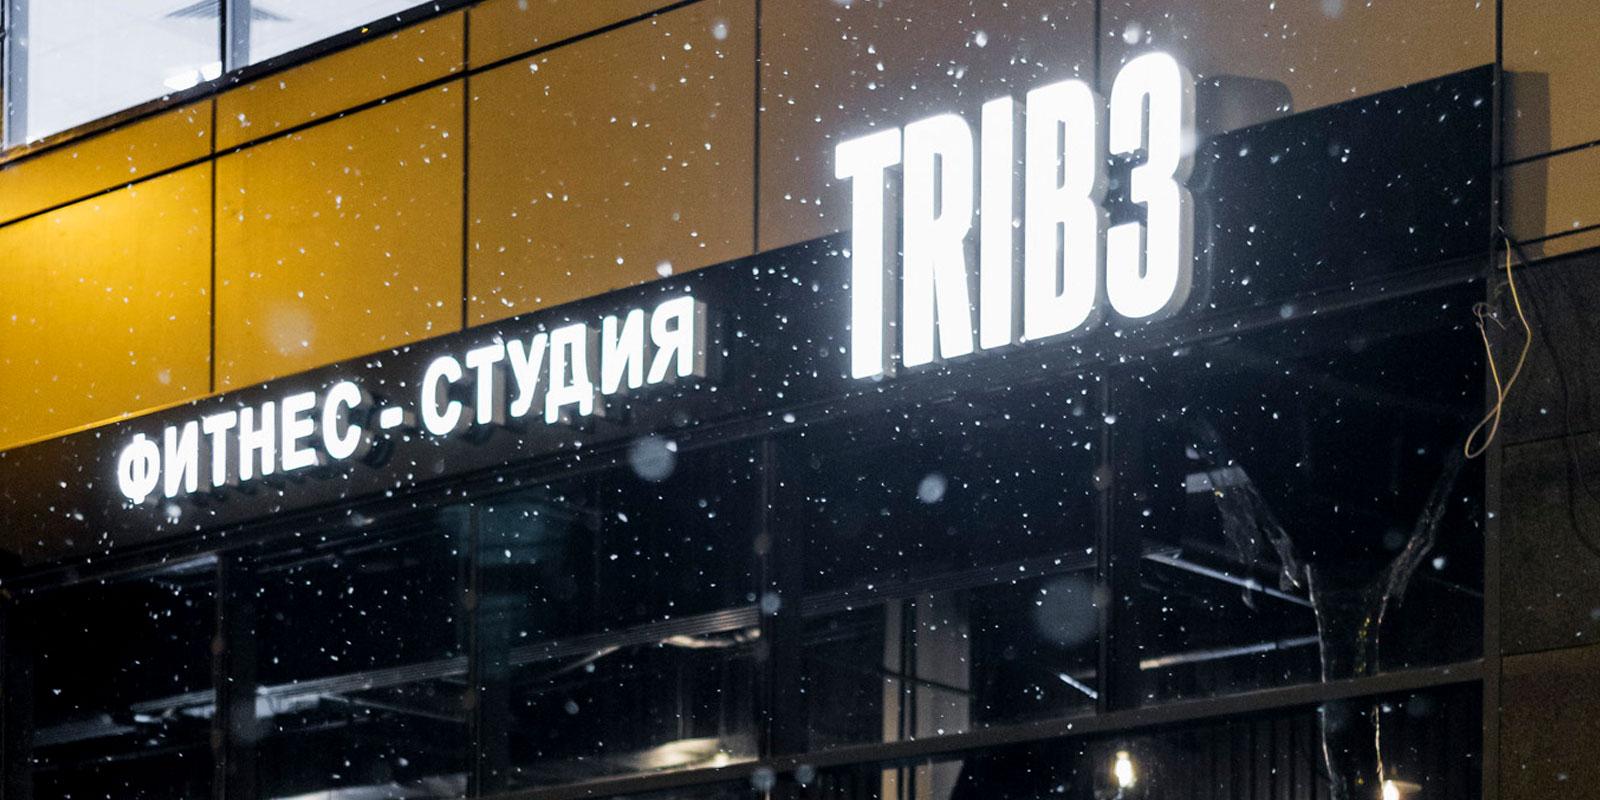 TRIB3 Moscow - Studio entrance